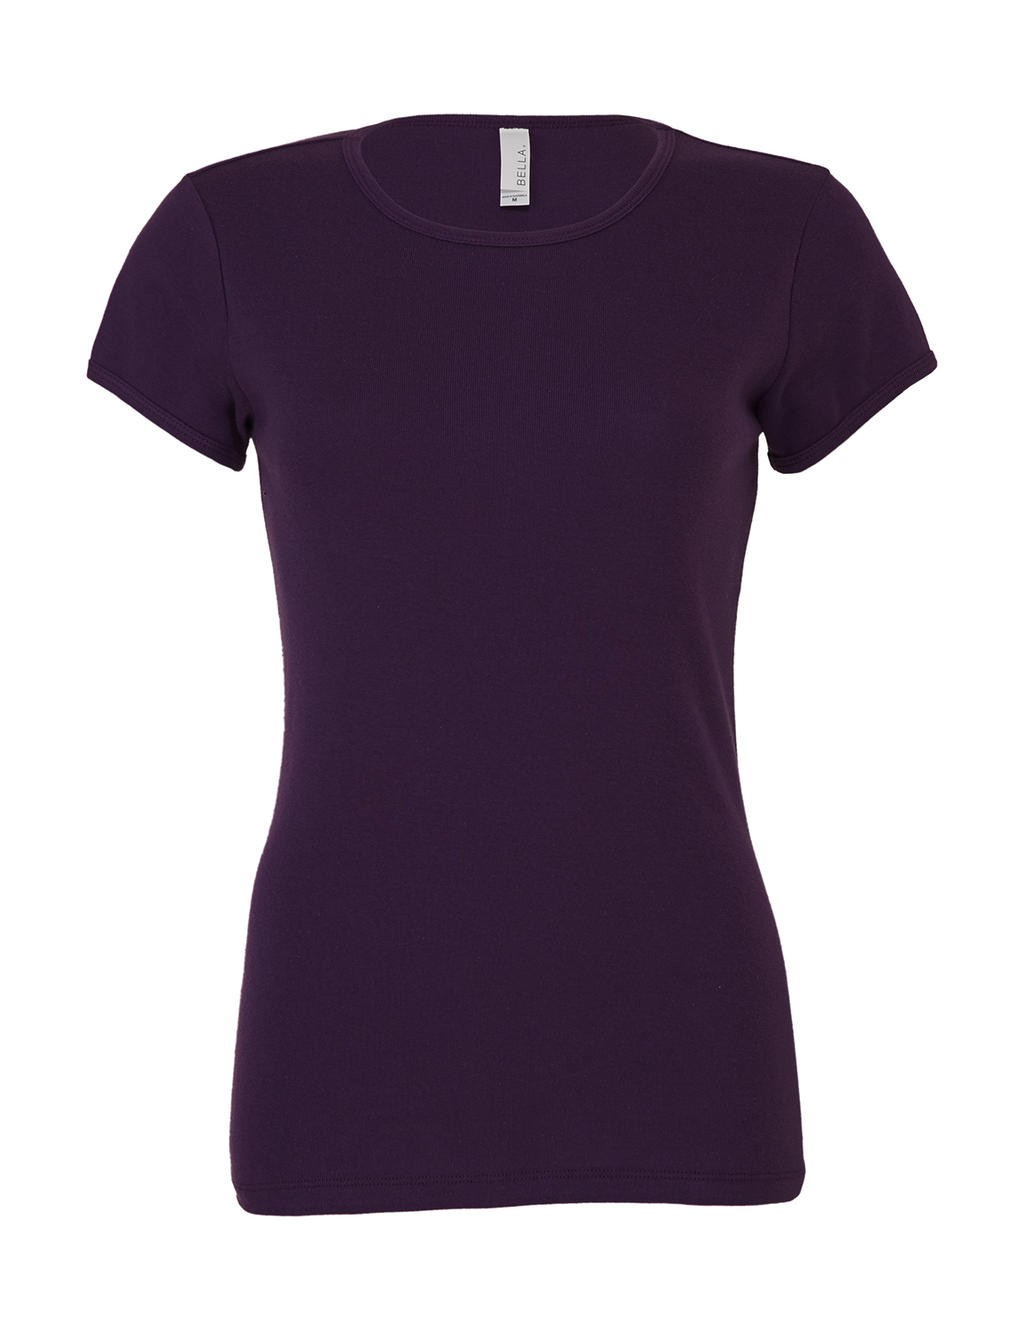 Bella+Canvas: Stretch Rib T-Shirt 1001:00:00 – Bild